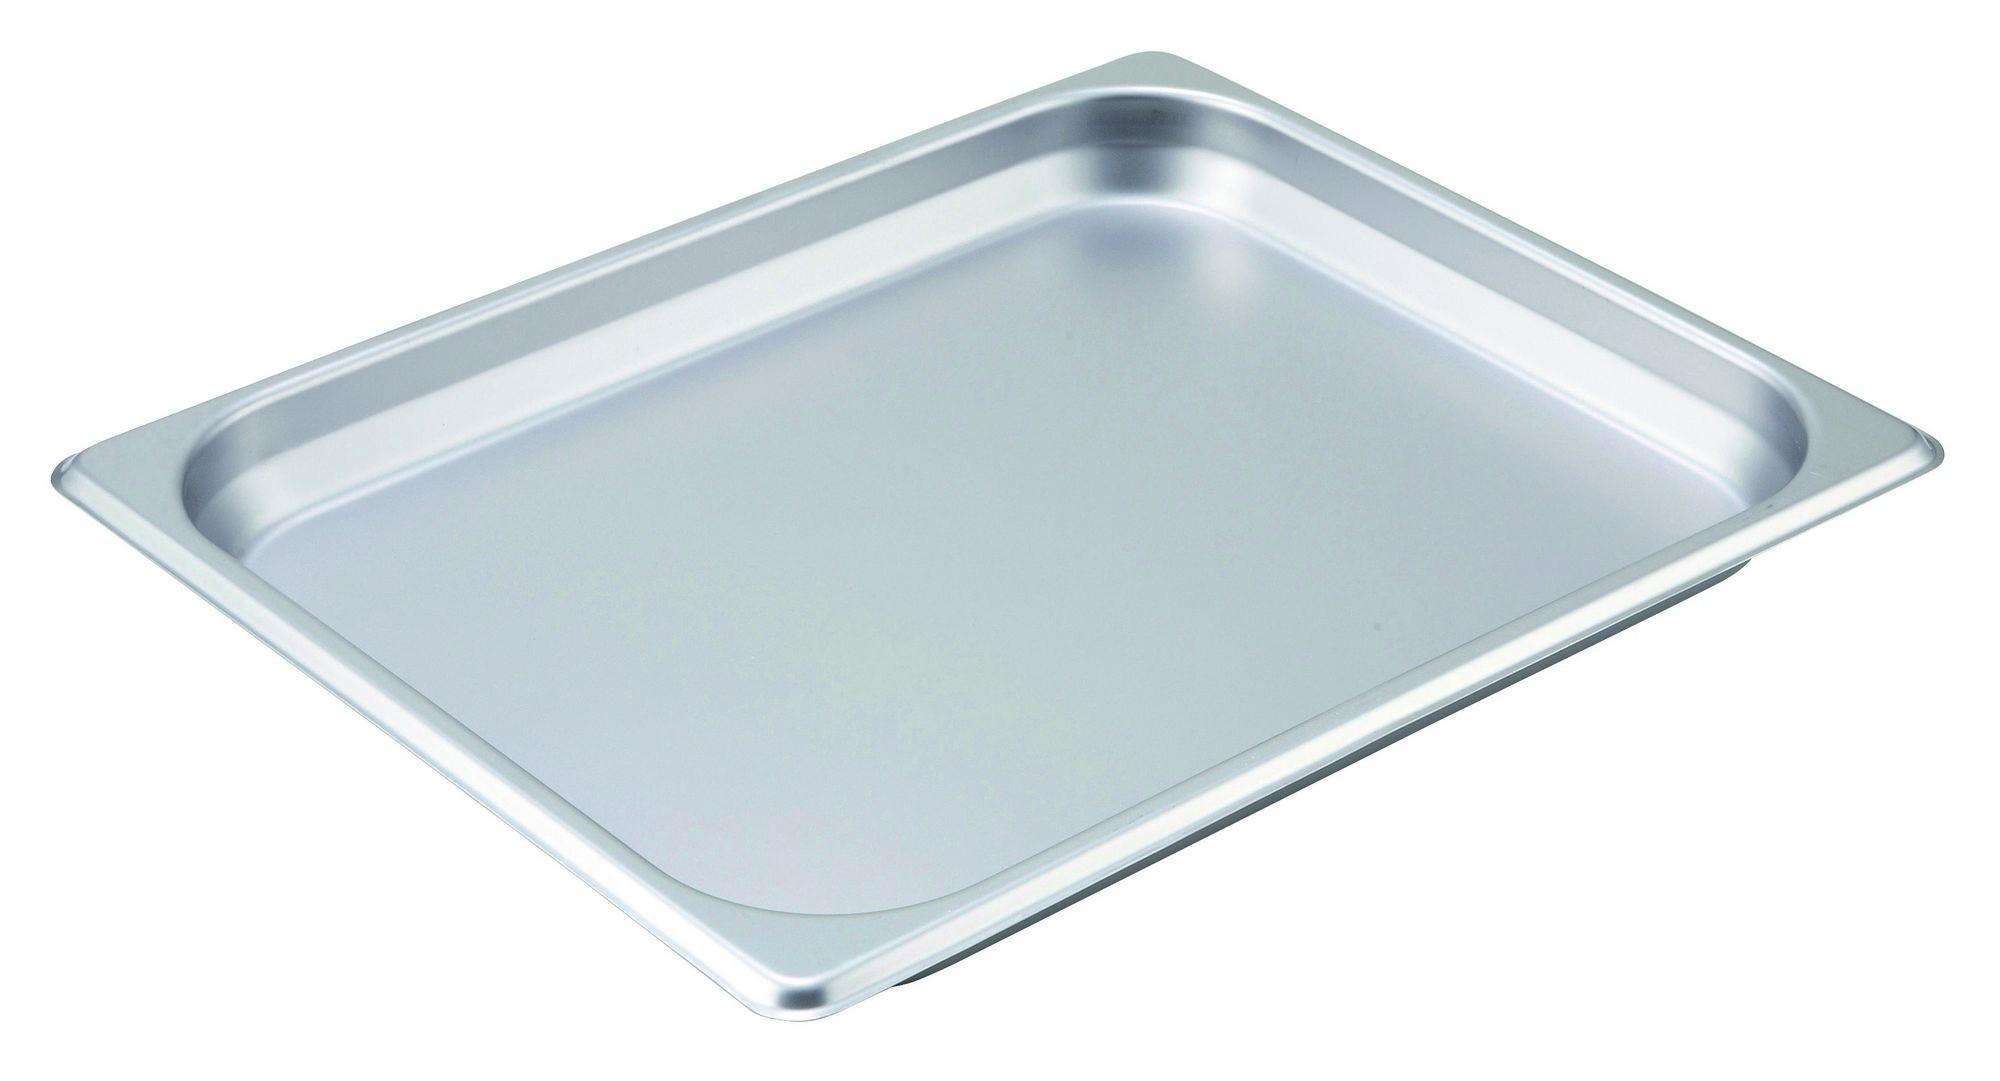 "Winco SPH1 Half Size Steam Table Pan 1-1/4"" Deep"